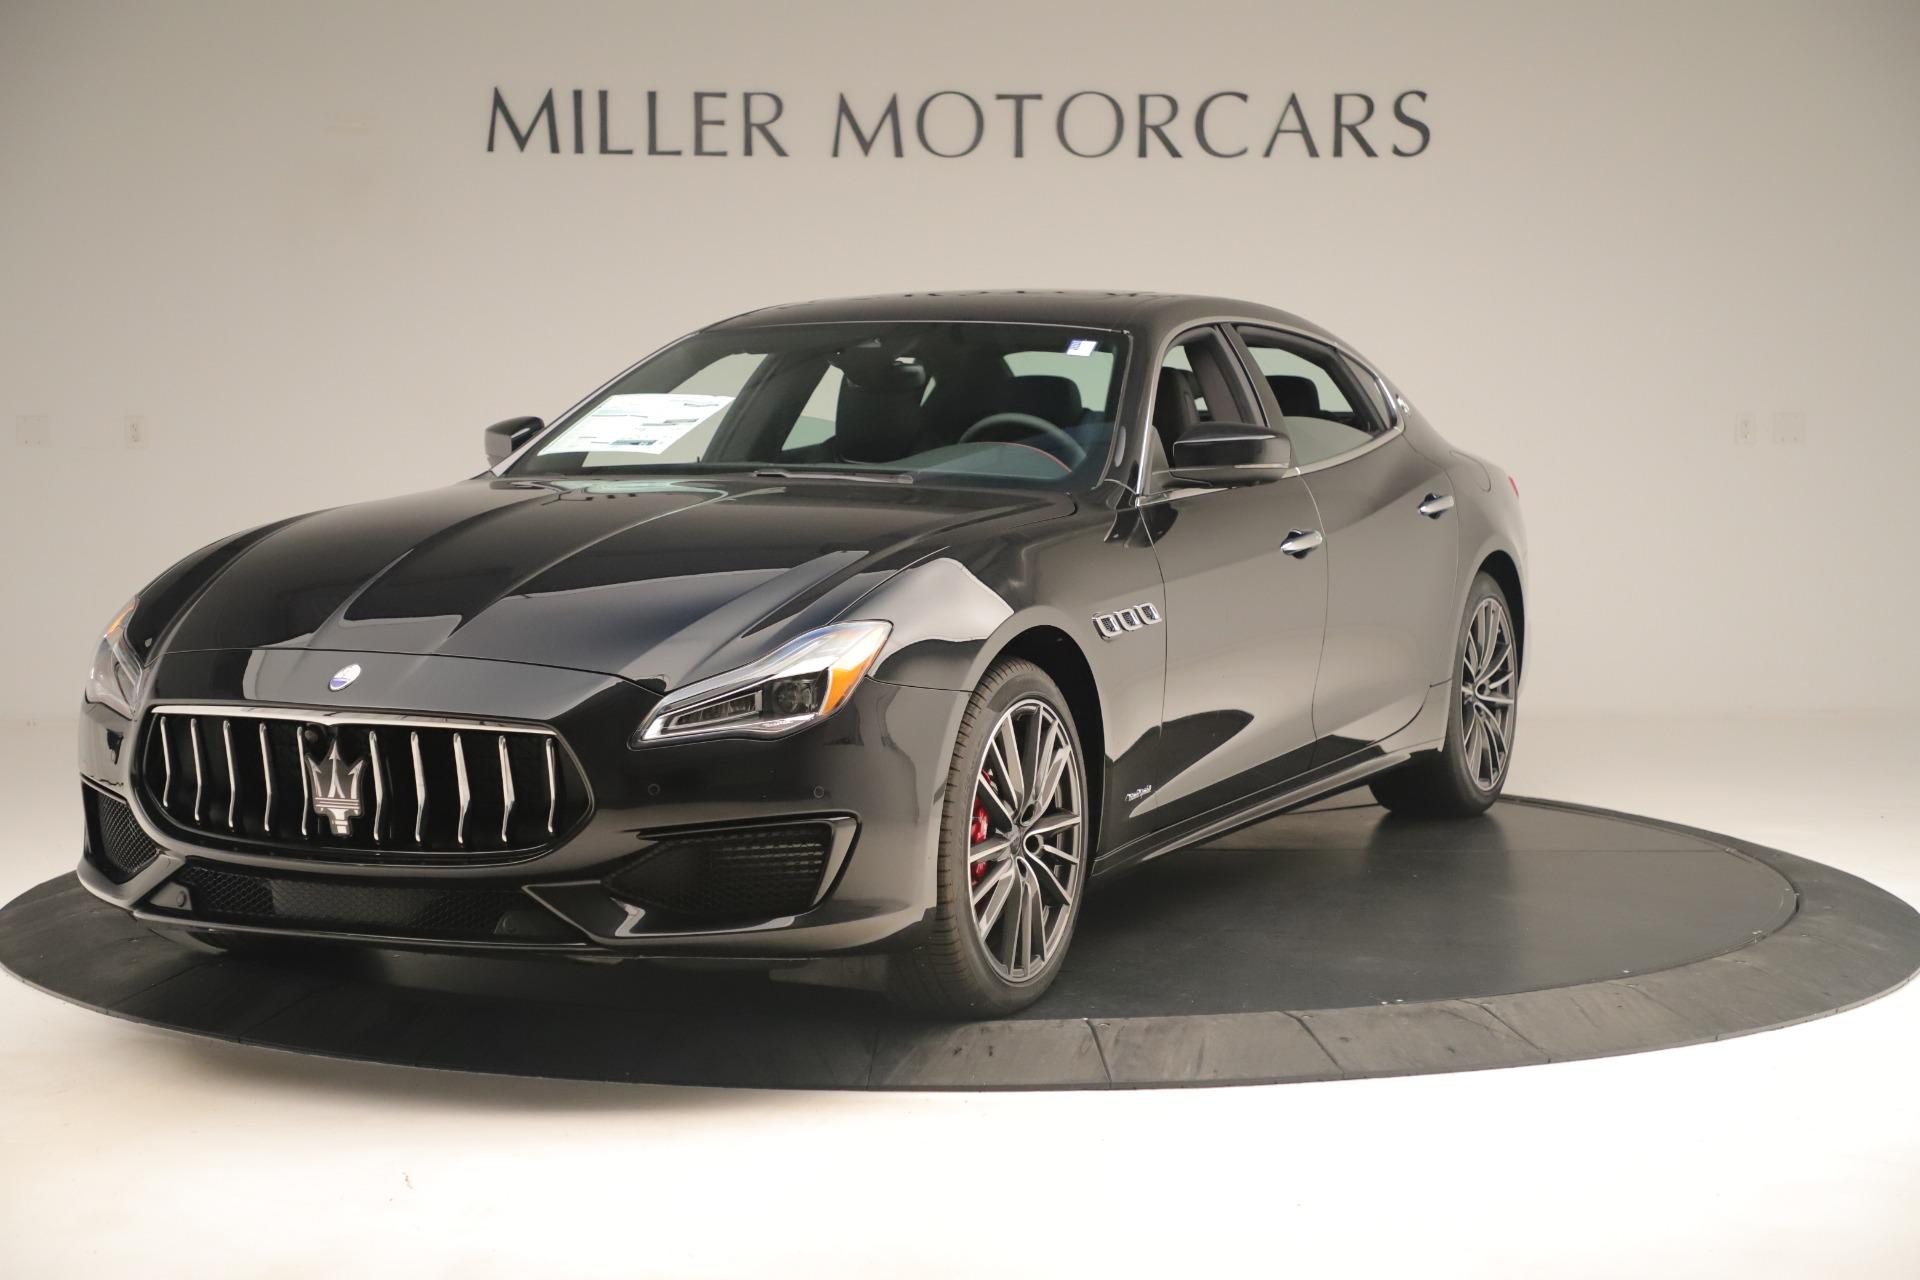 New 2019 Maserati Quattroporte S Q4 GranSport for sale $130,855 at Bentley Greenwich in Greenwich CT 06830 1